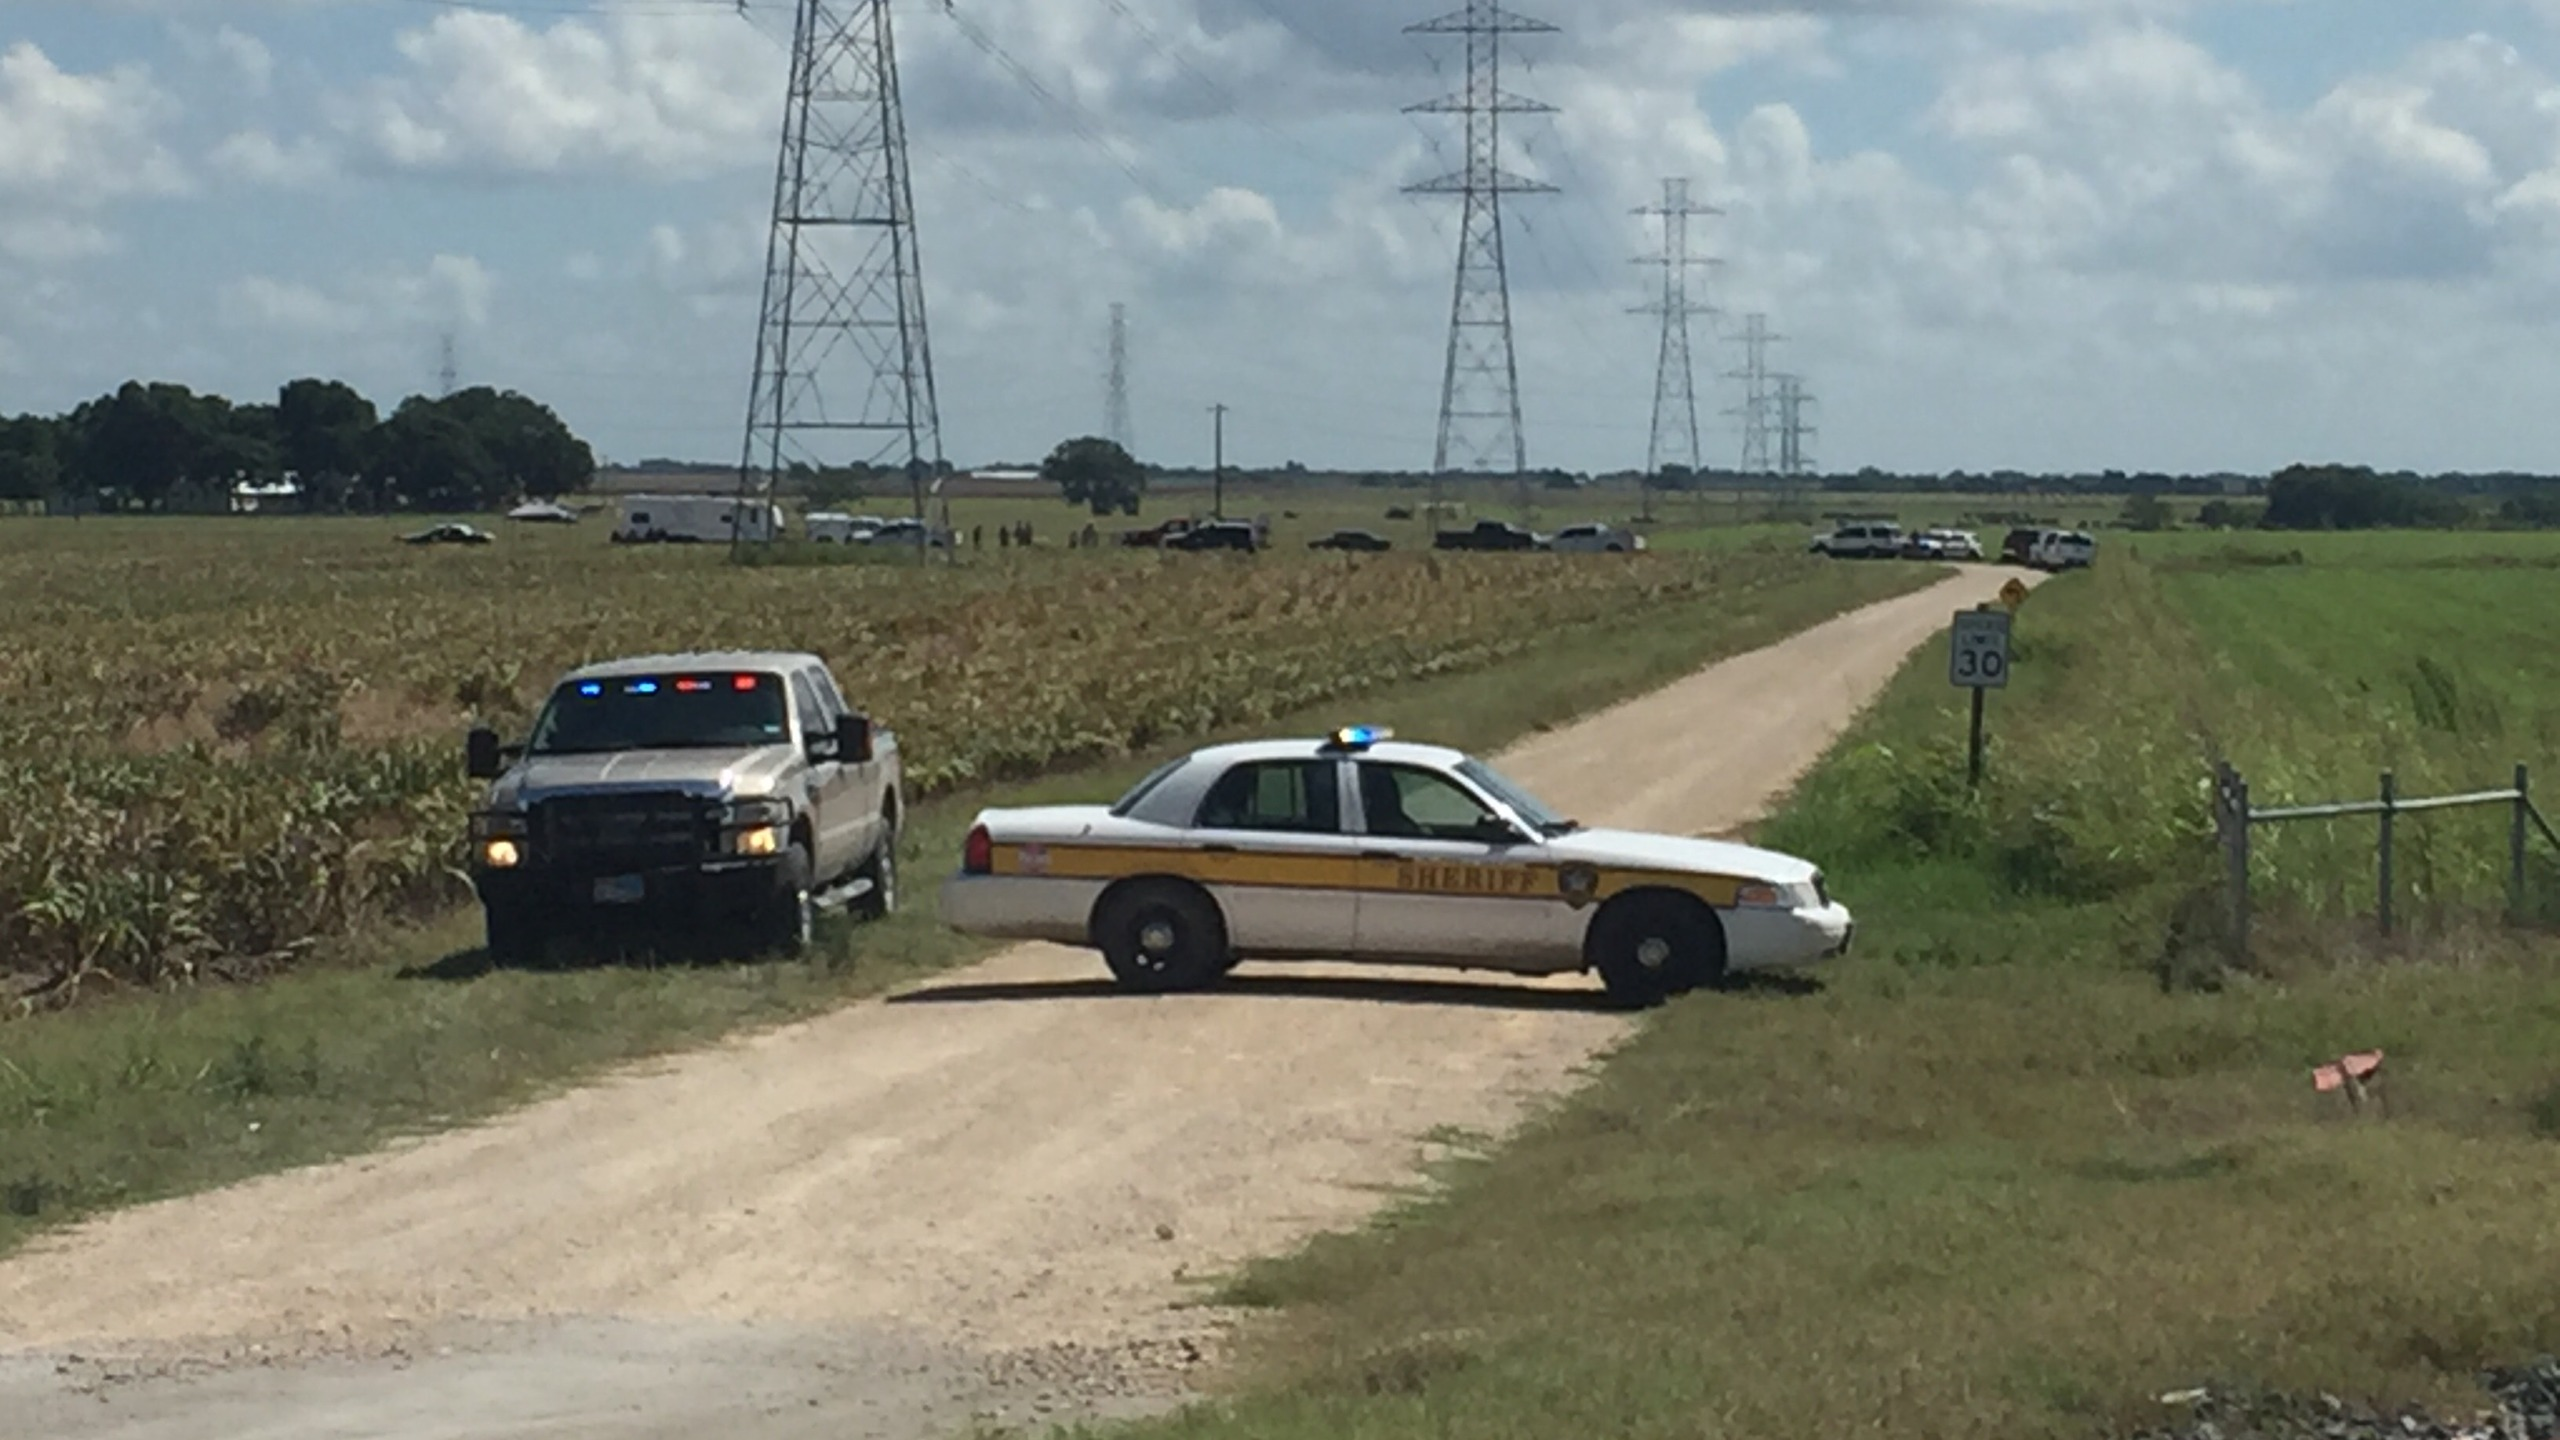 In-Depth: Hot air balloon crash history in Texas